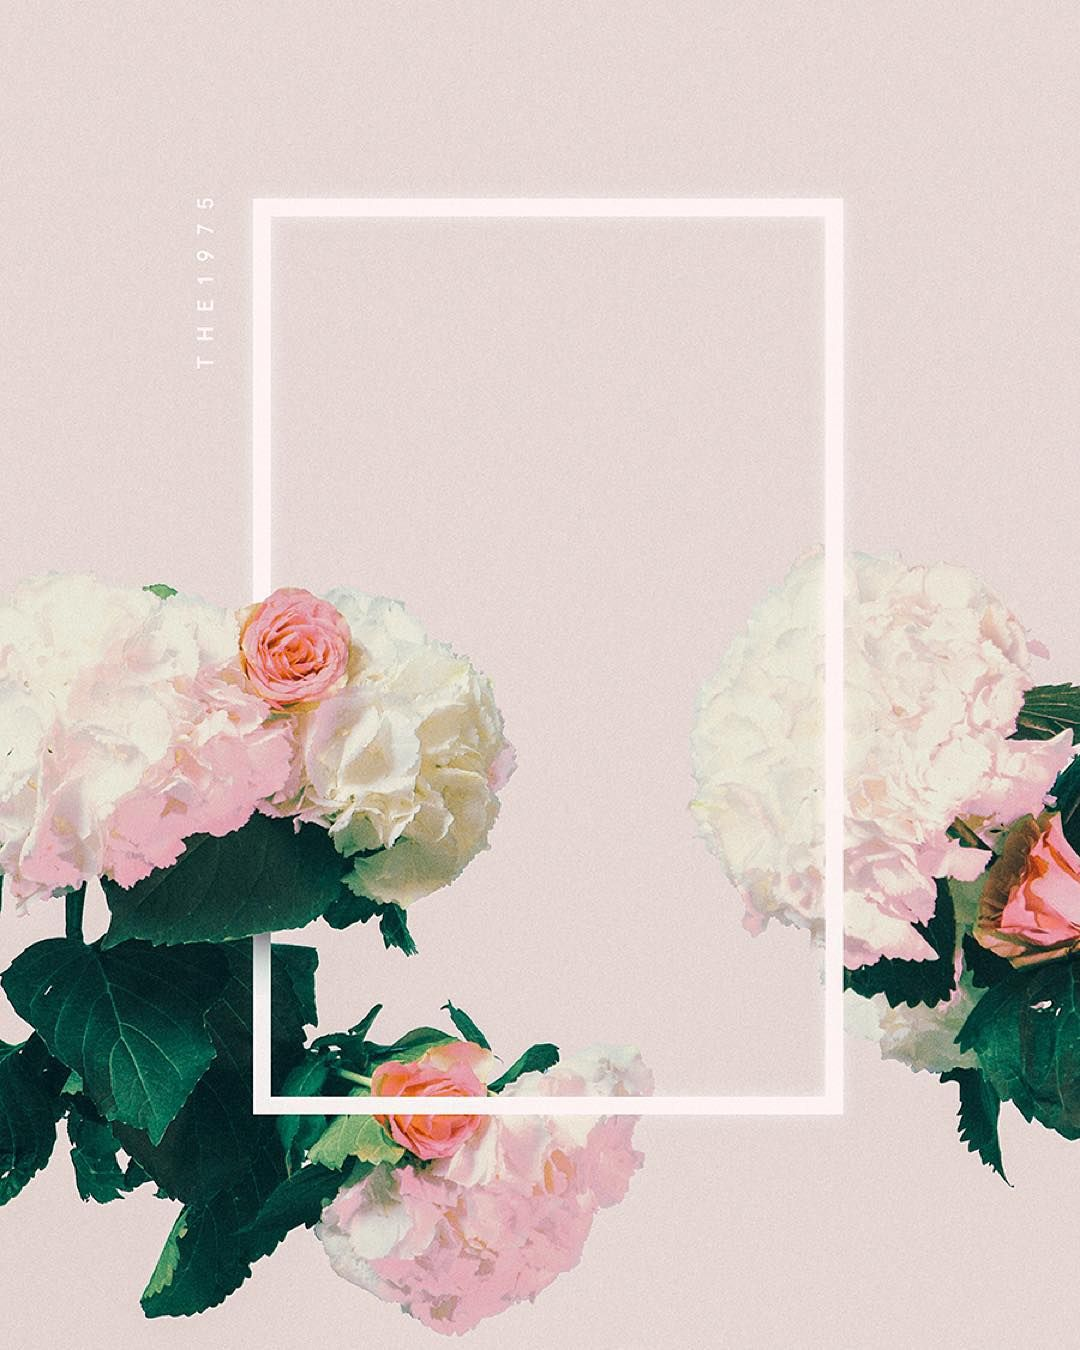 ✿*゚ @crystallinelife ✿*゚